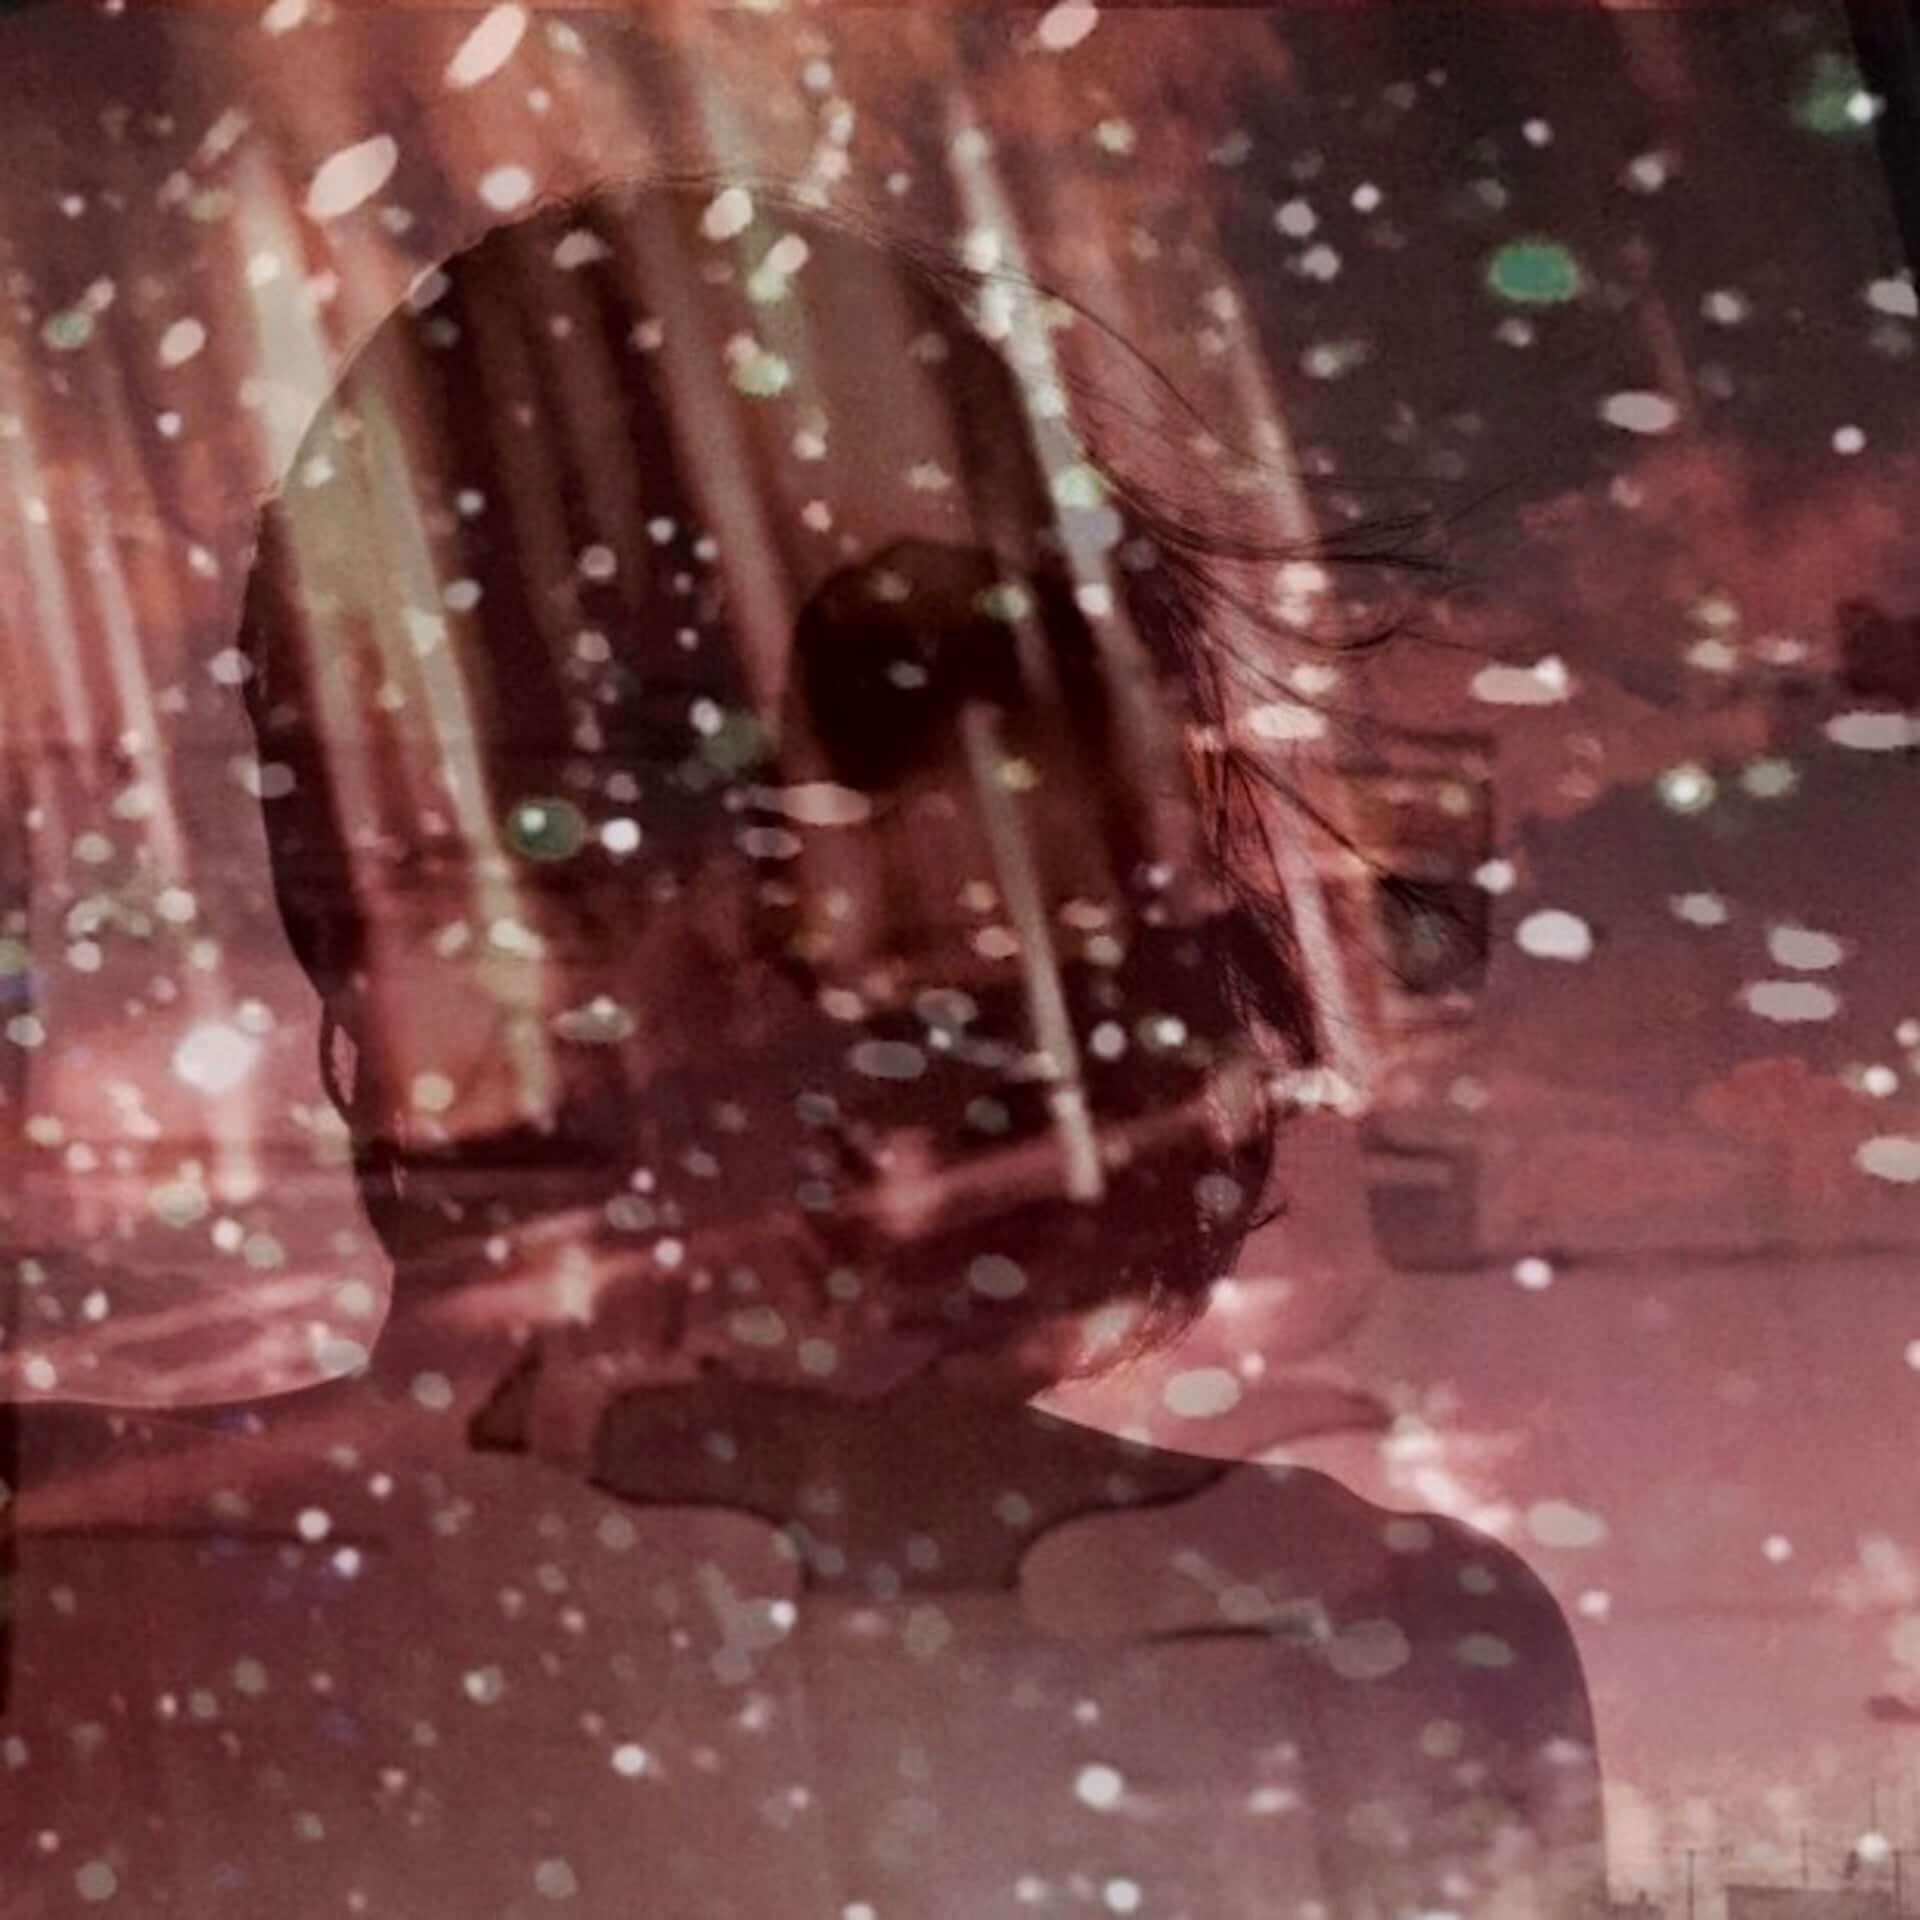 OTOTOYの施設支援企画「Save Our Place」第4弾音源として8作品が配信開始 高野寛の未発表音源集や田中光参加のコンピも music200423_saveourplace_16-1920x1920